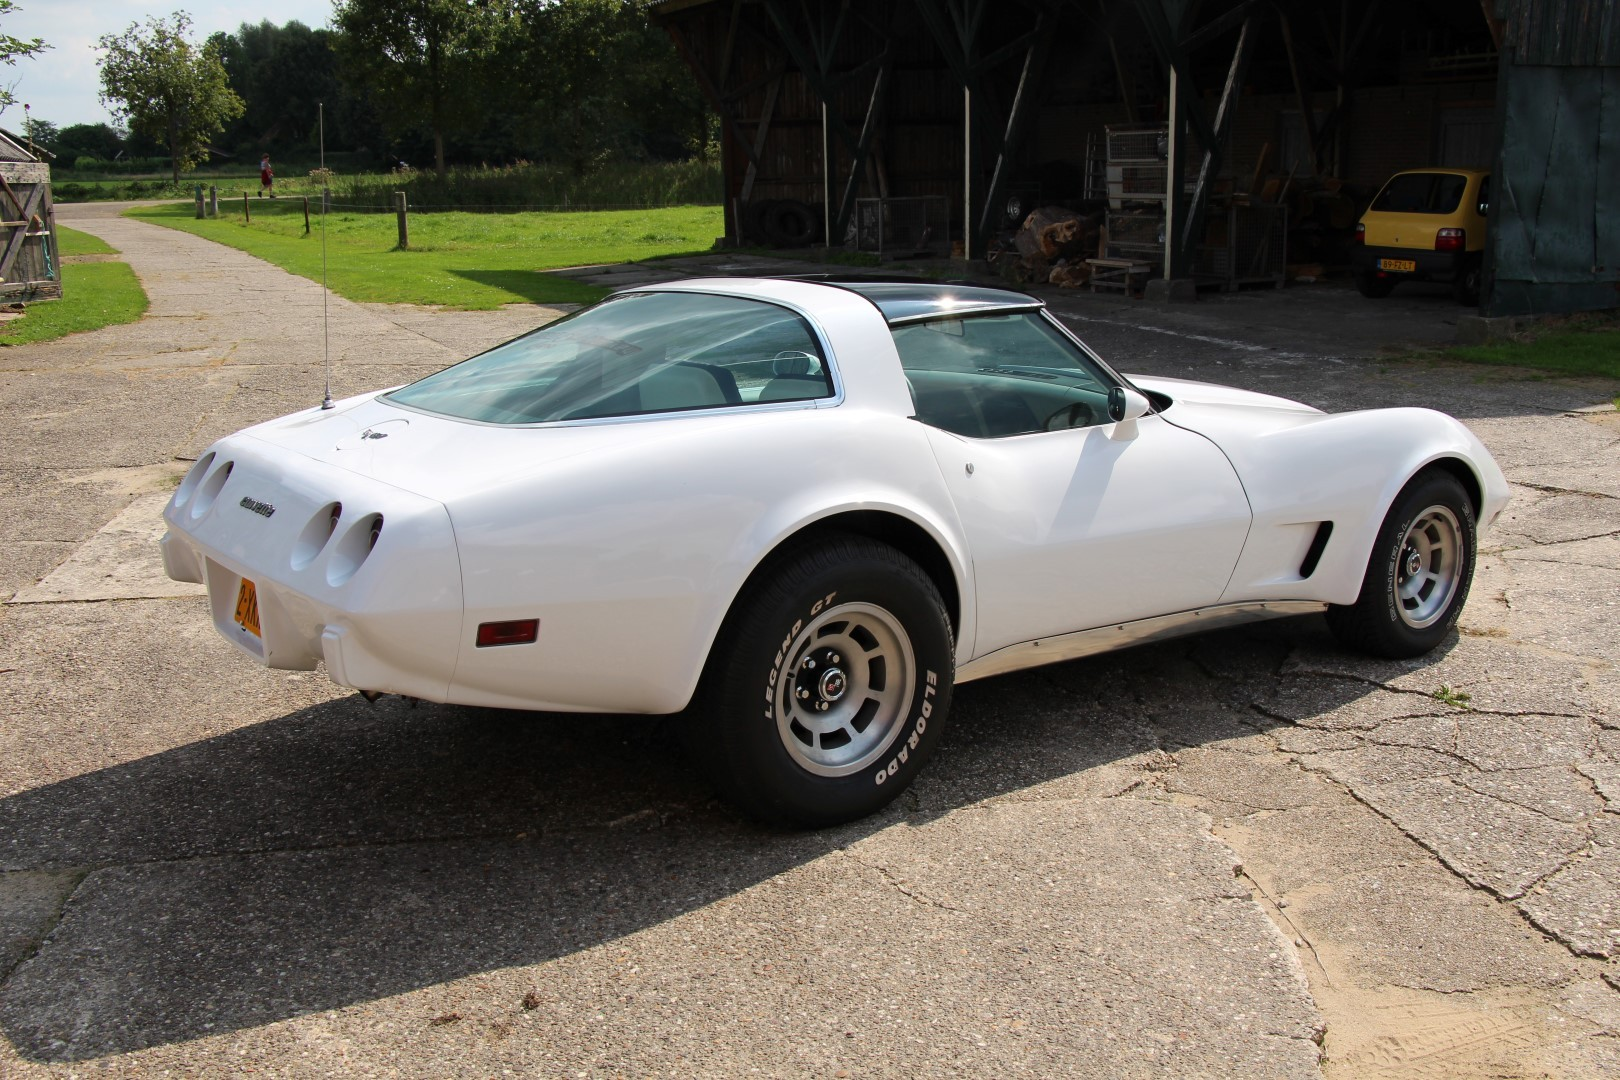 1979 Corvette Corvette Stingray